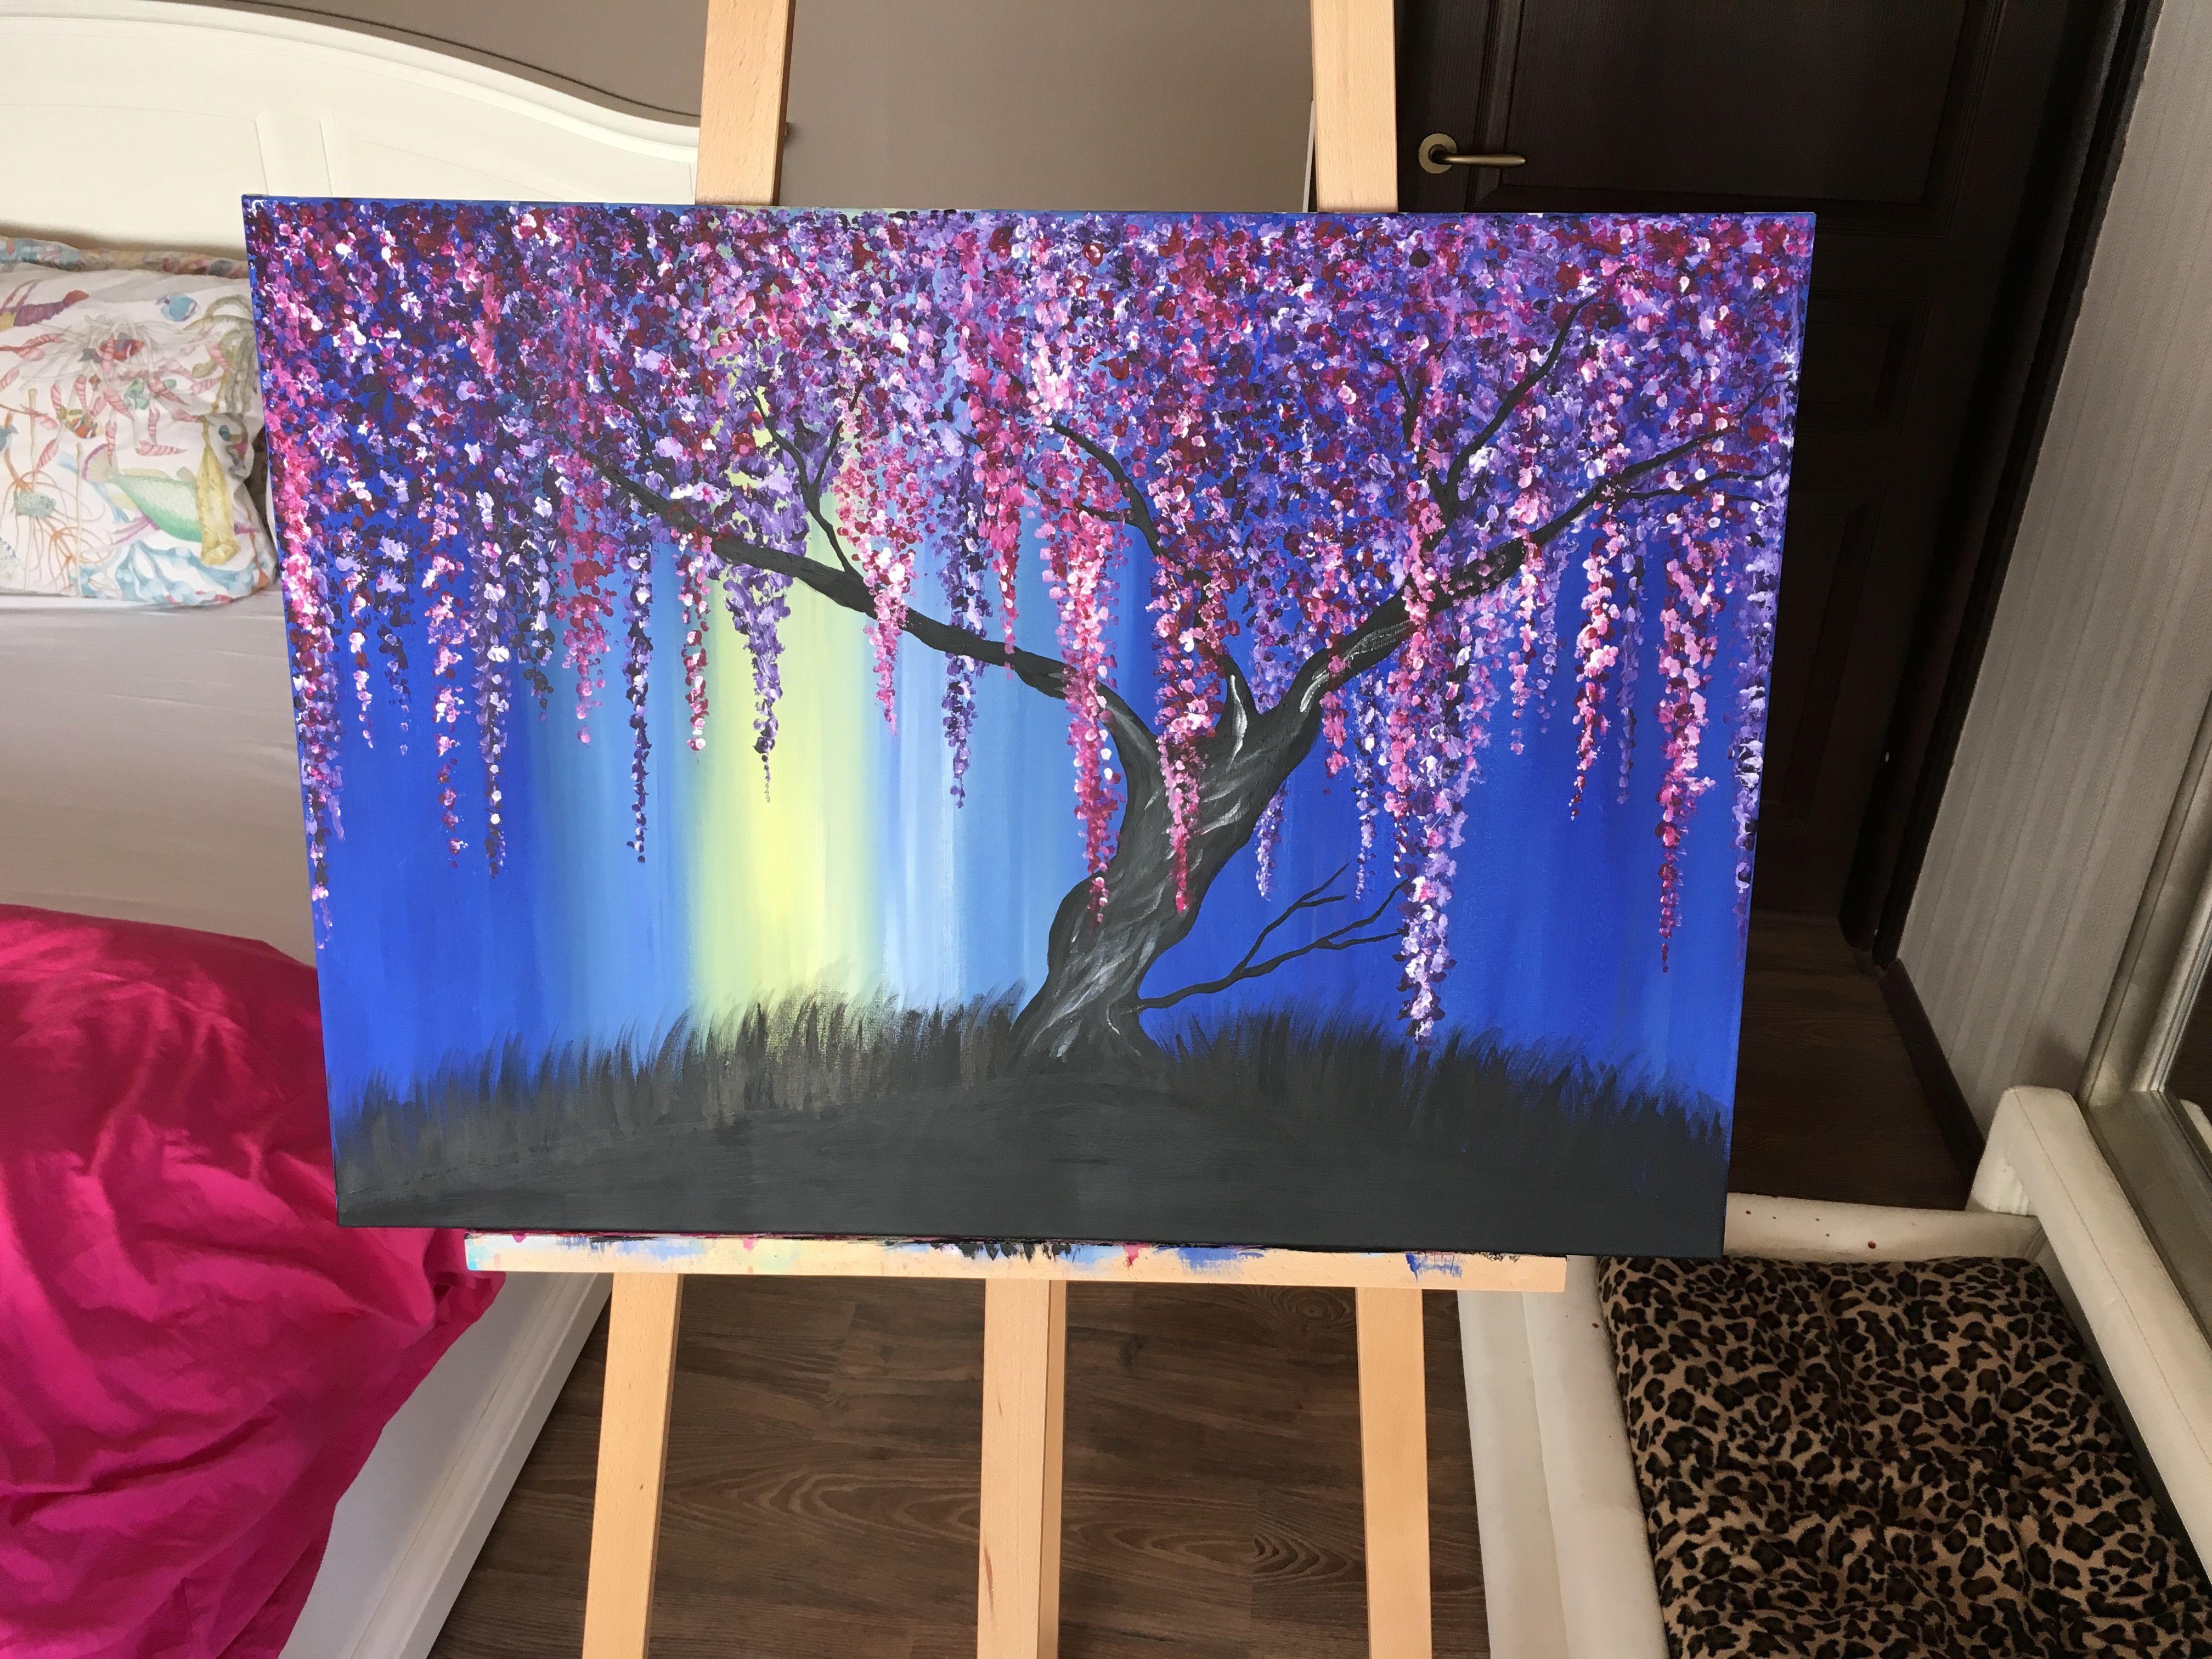 #Amazing #Amazingview #Paradiseisland #Canvas #Tree #Paint #Painting #Cascadeofcolours